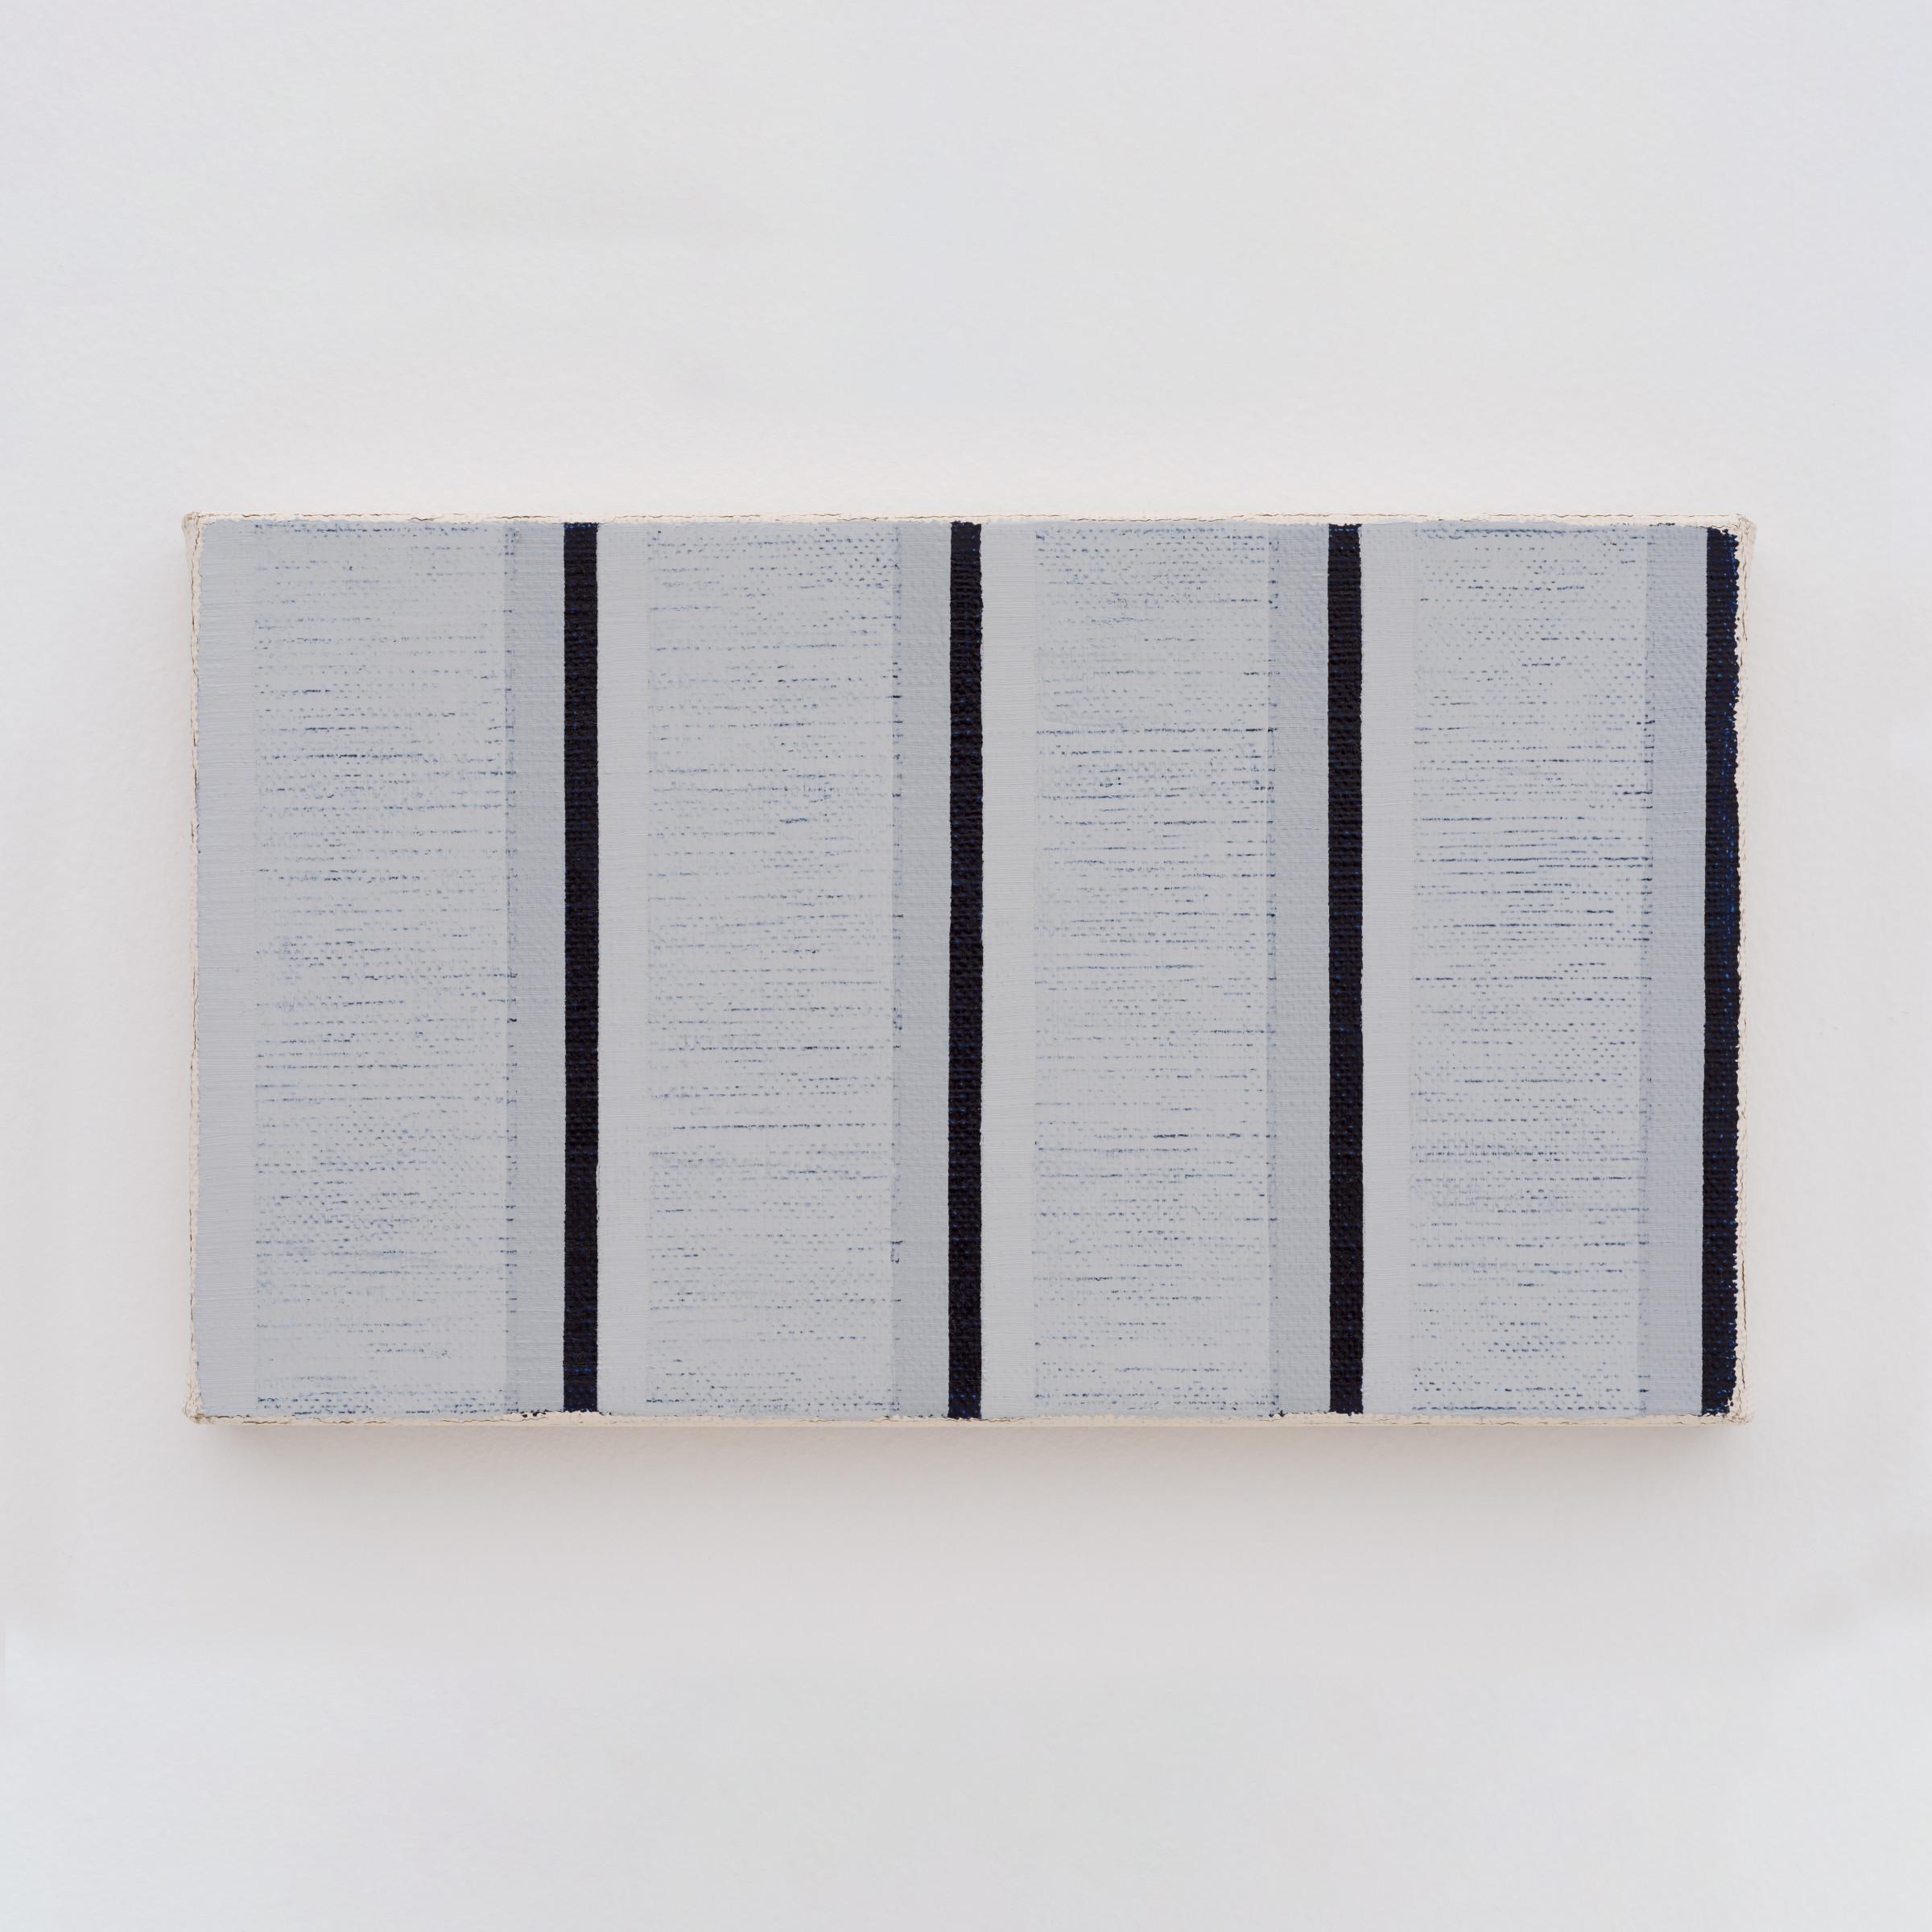 "<span class=""link fancybox-details-link""><a href=""/exhibitions/172/works/artworks16575/"">View Detail Page</a></span><div class=""artist""><strong>Yui Yaegashi</strong></div><div class=""title""><em>white-grey-black No.5</em>, 2019</div><div class=""medium"">oil on canvas</div><div class=""dimensions"">16,5 x 28 cm</div>"